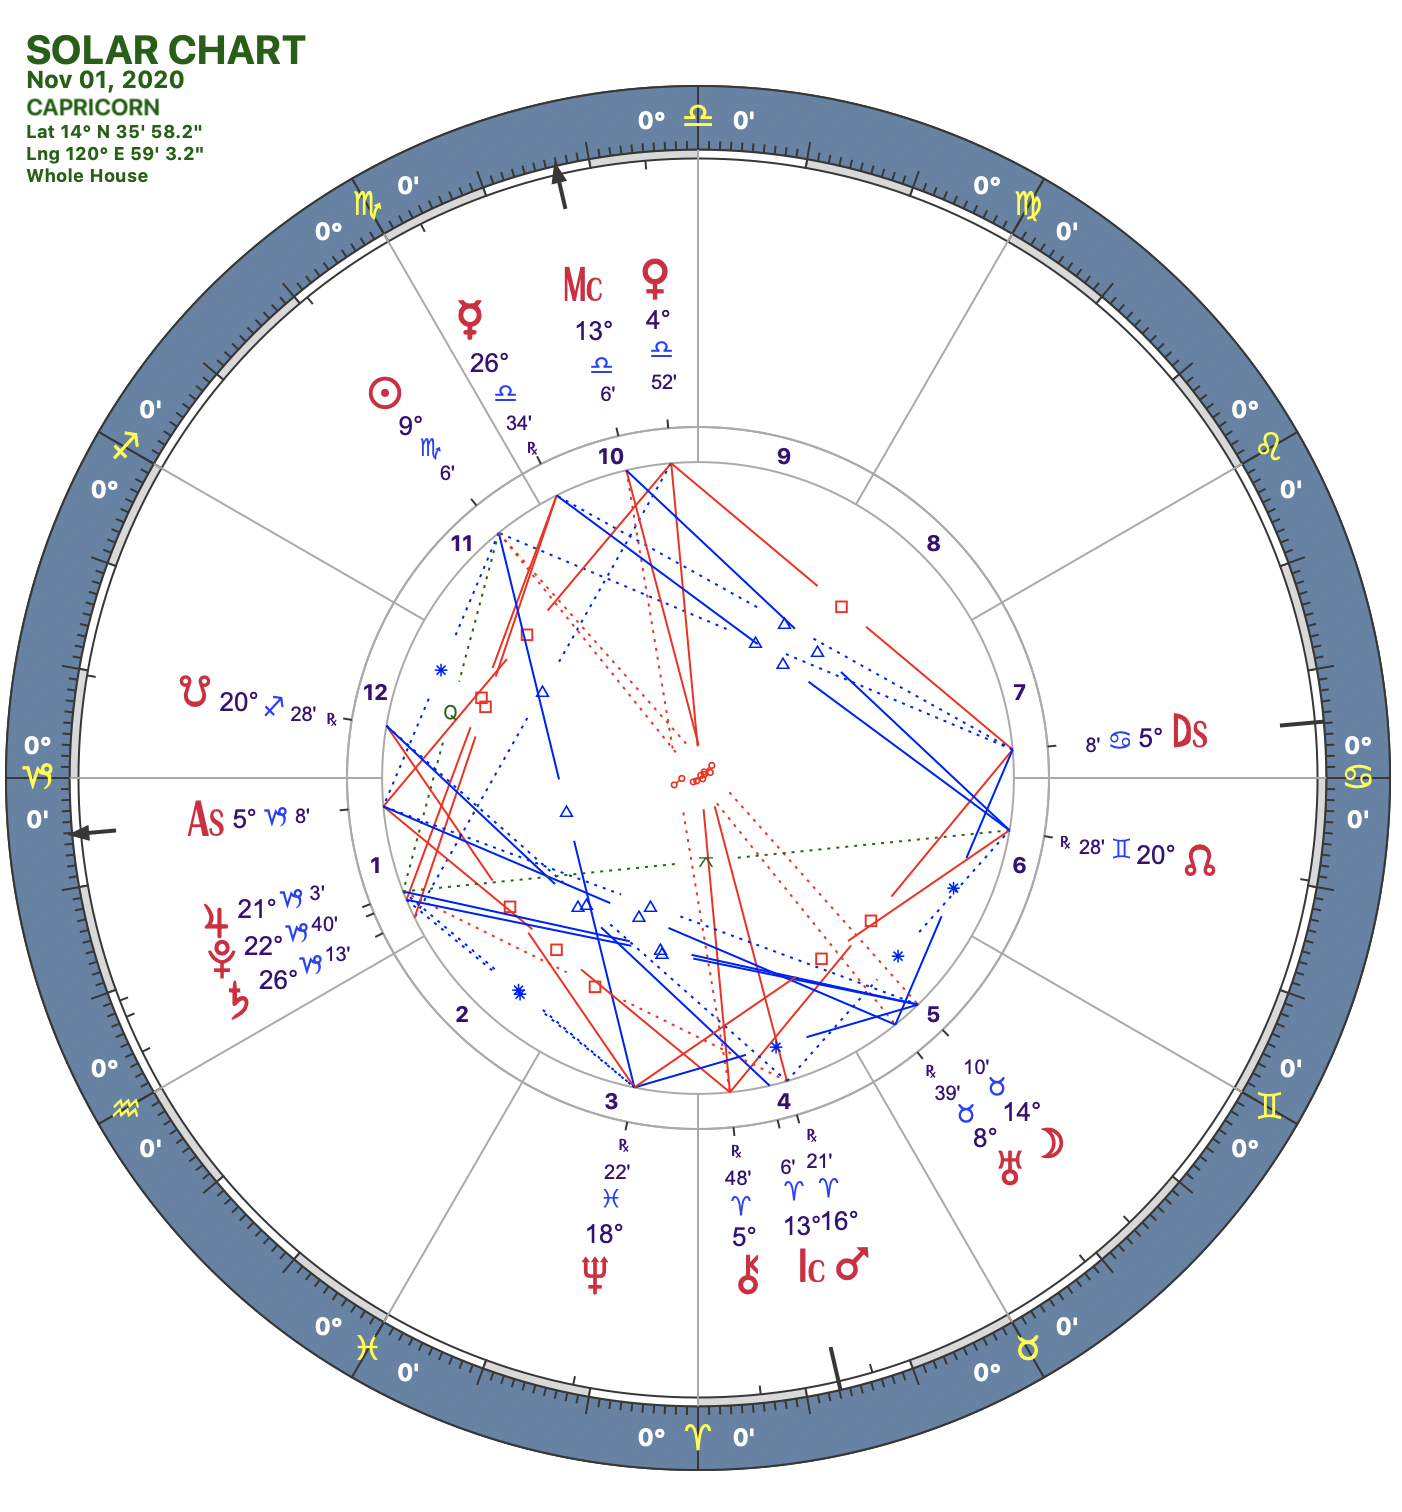 2020 11:Solar Chart:10 Capricorn